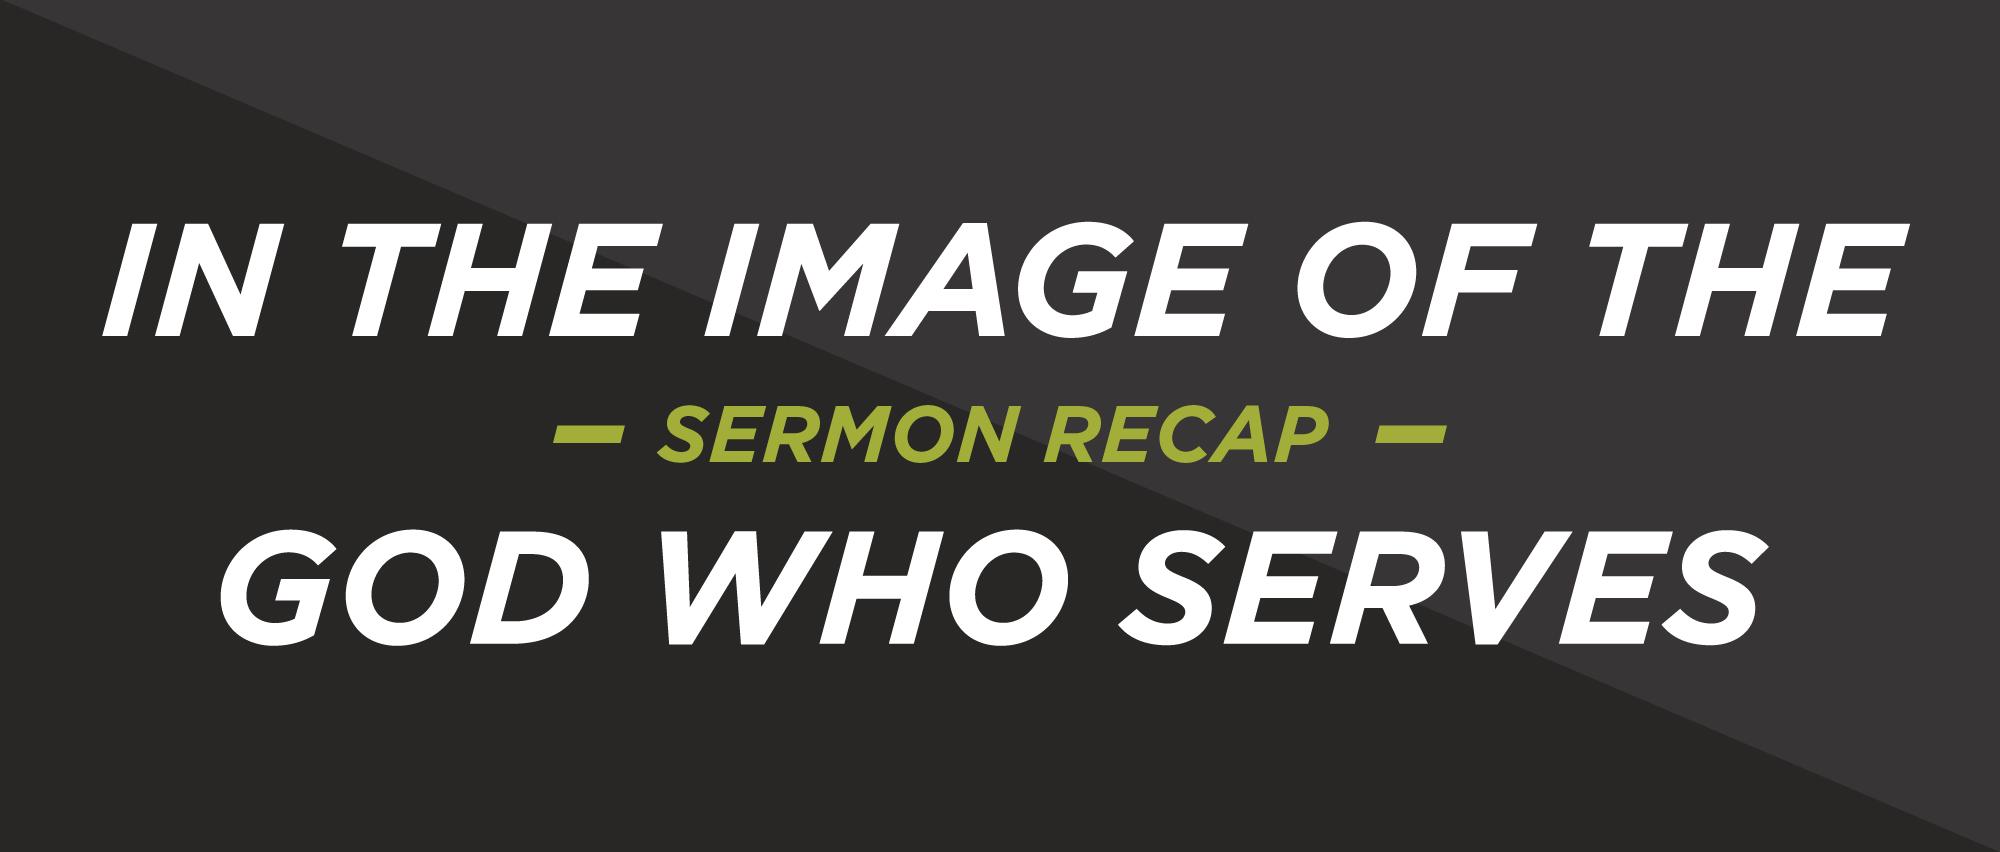 STC-Series-w2-recap.jpg